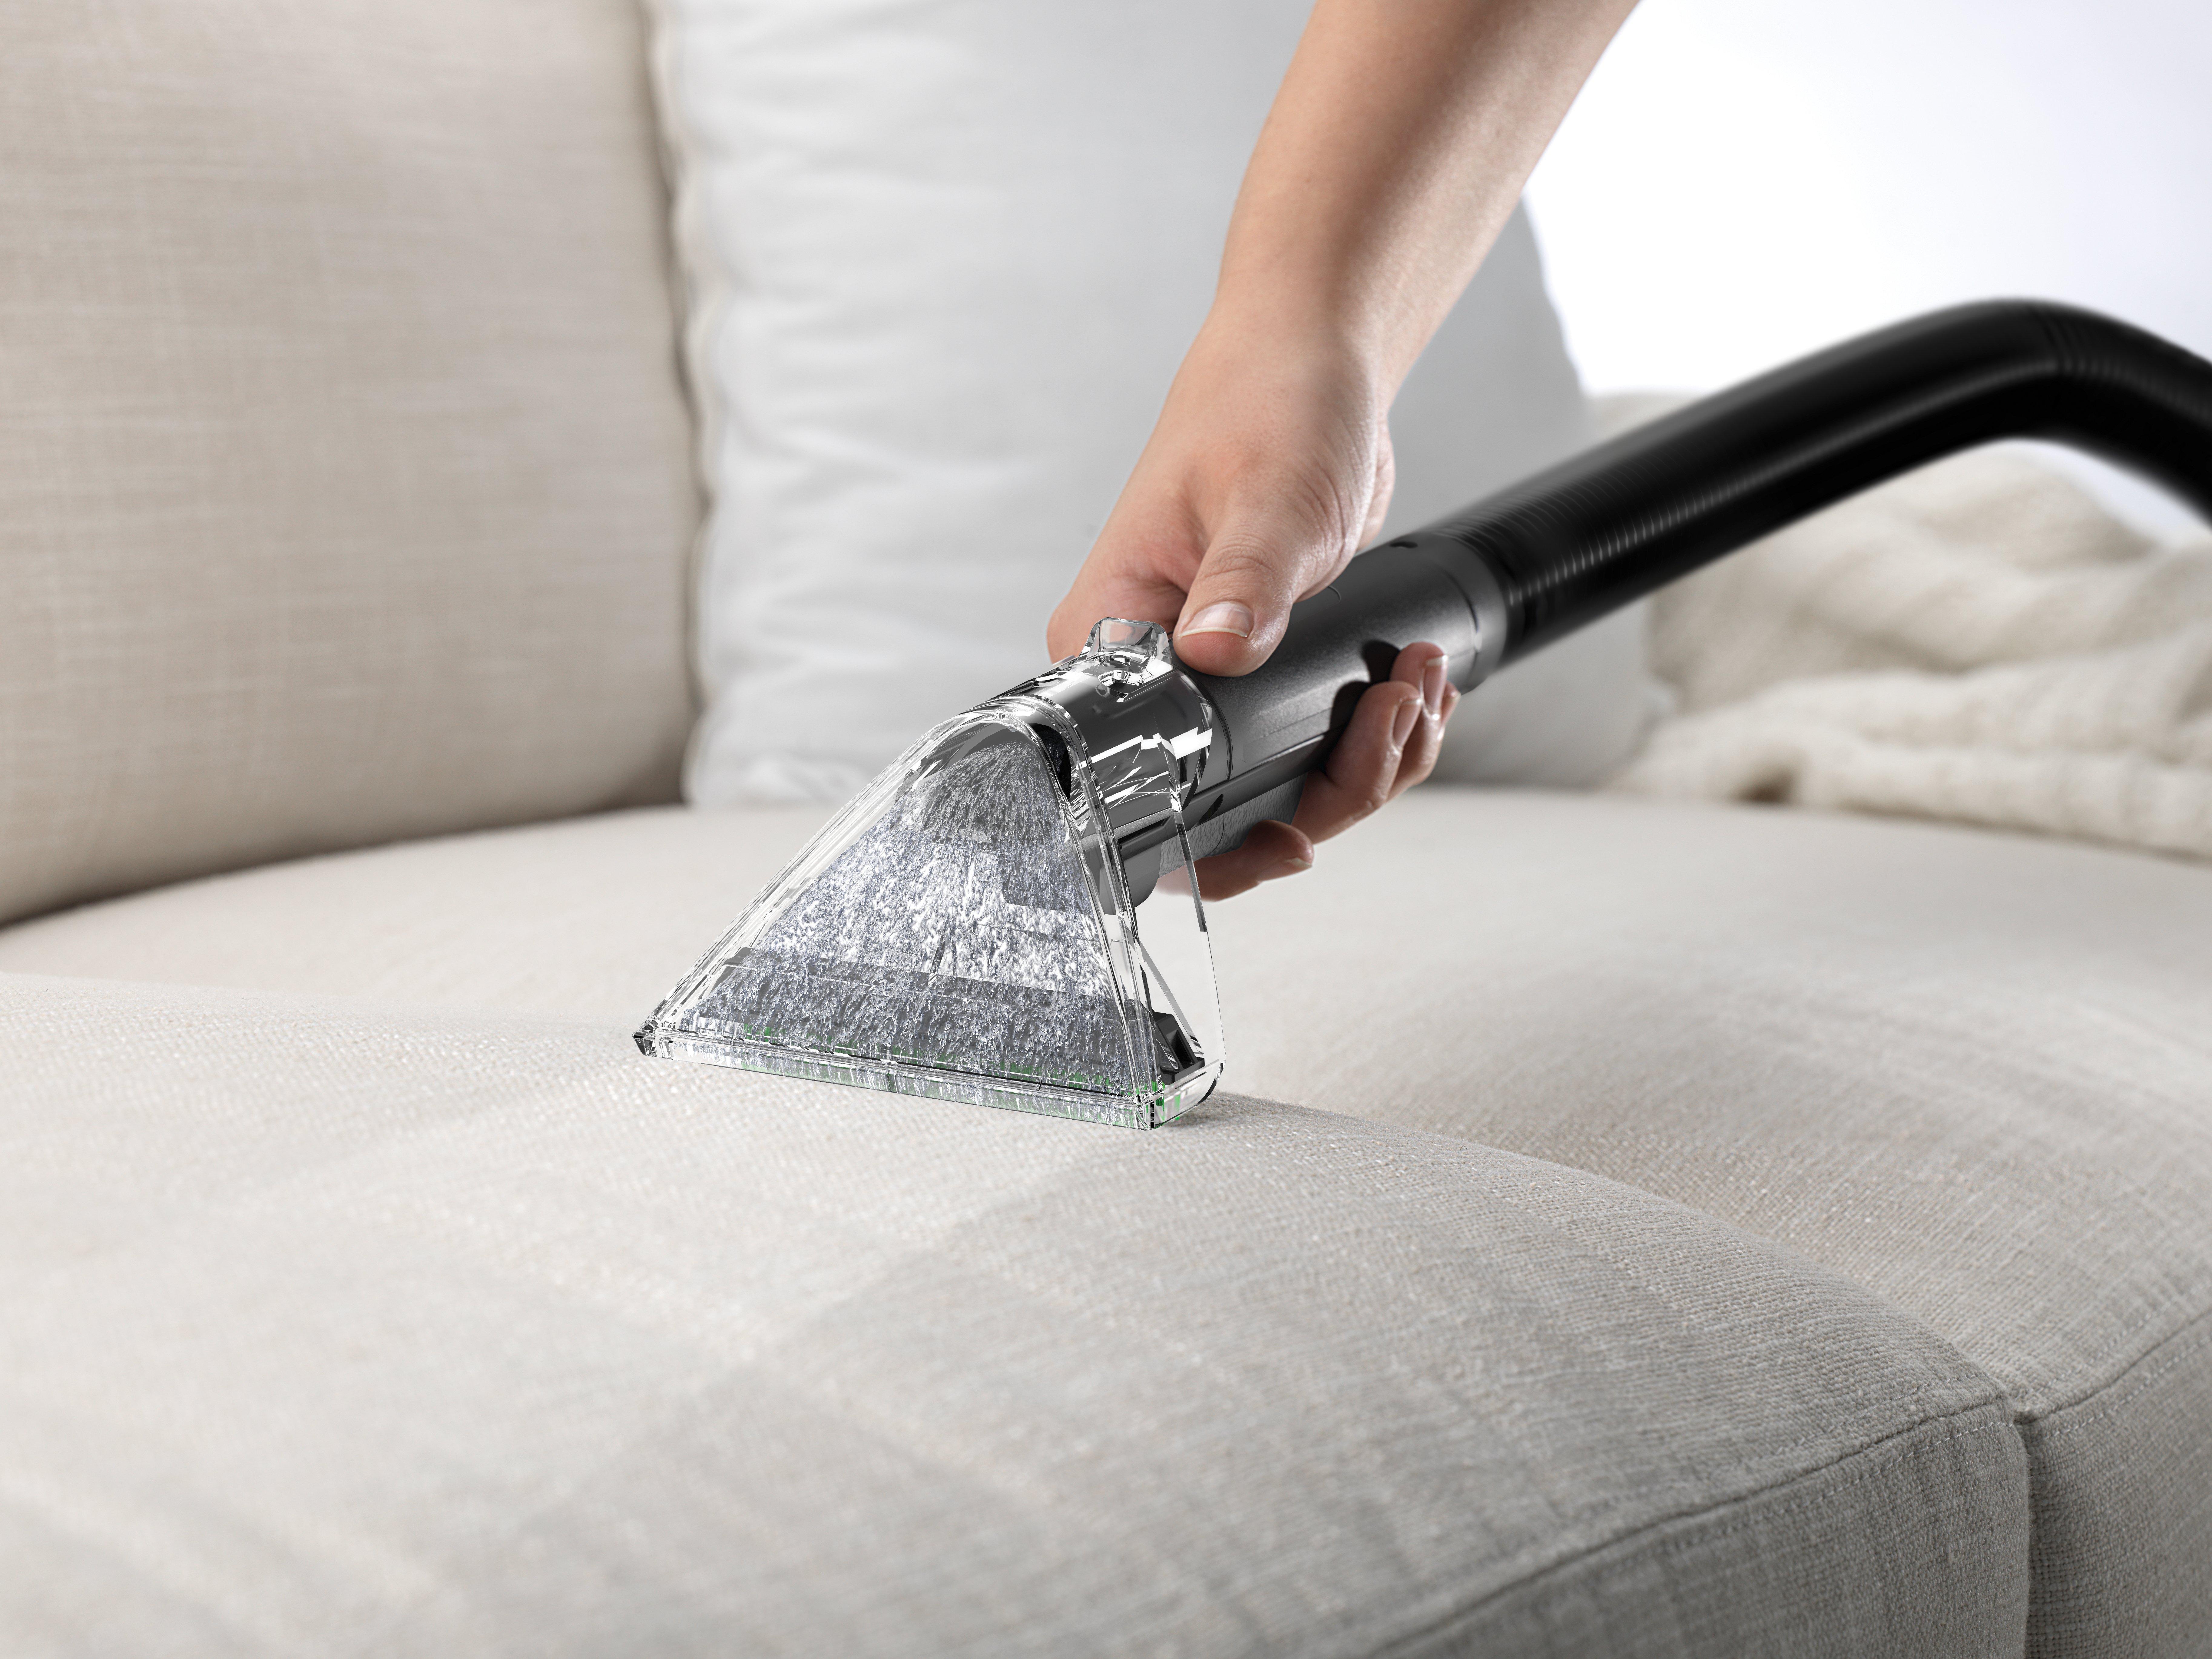 Turbo Scrub Carpet Cleaner6